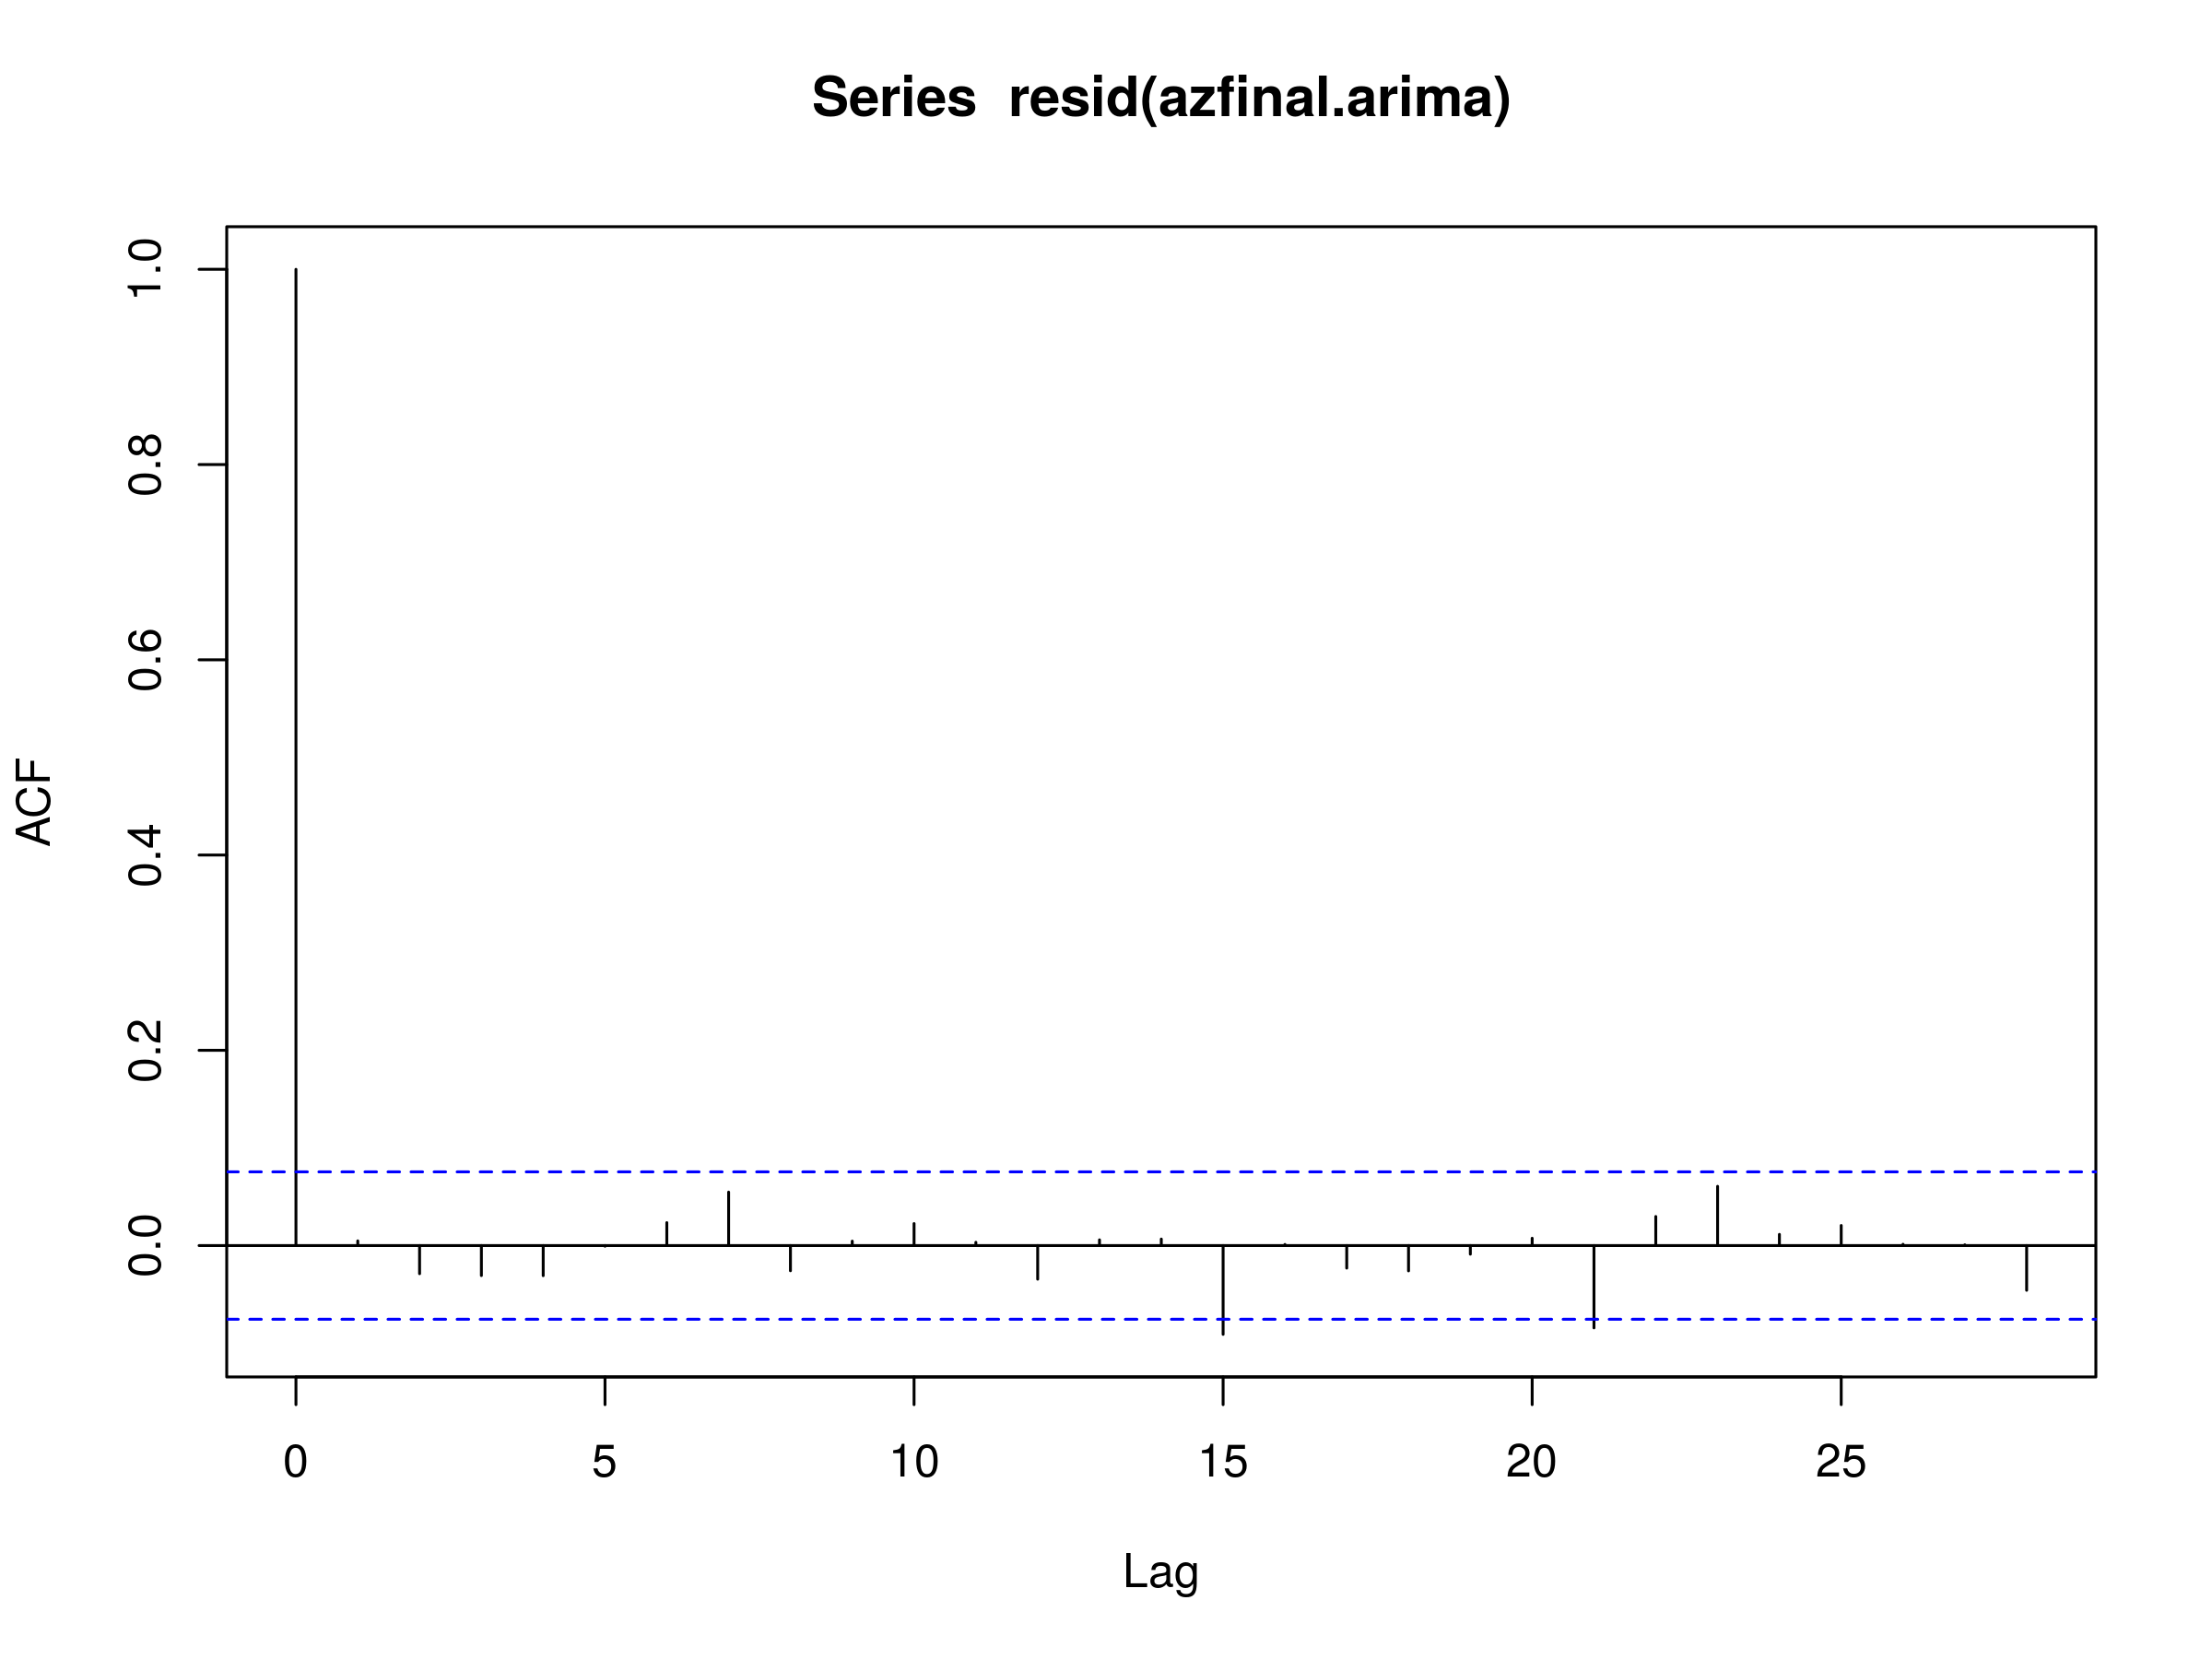 Autoregressive Integrated Moving Average ARIMA(p, d, q) Models for